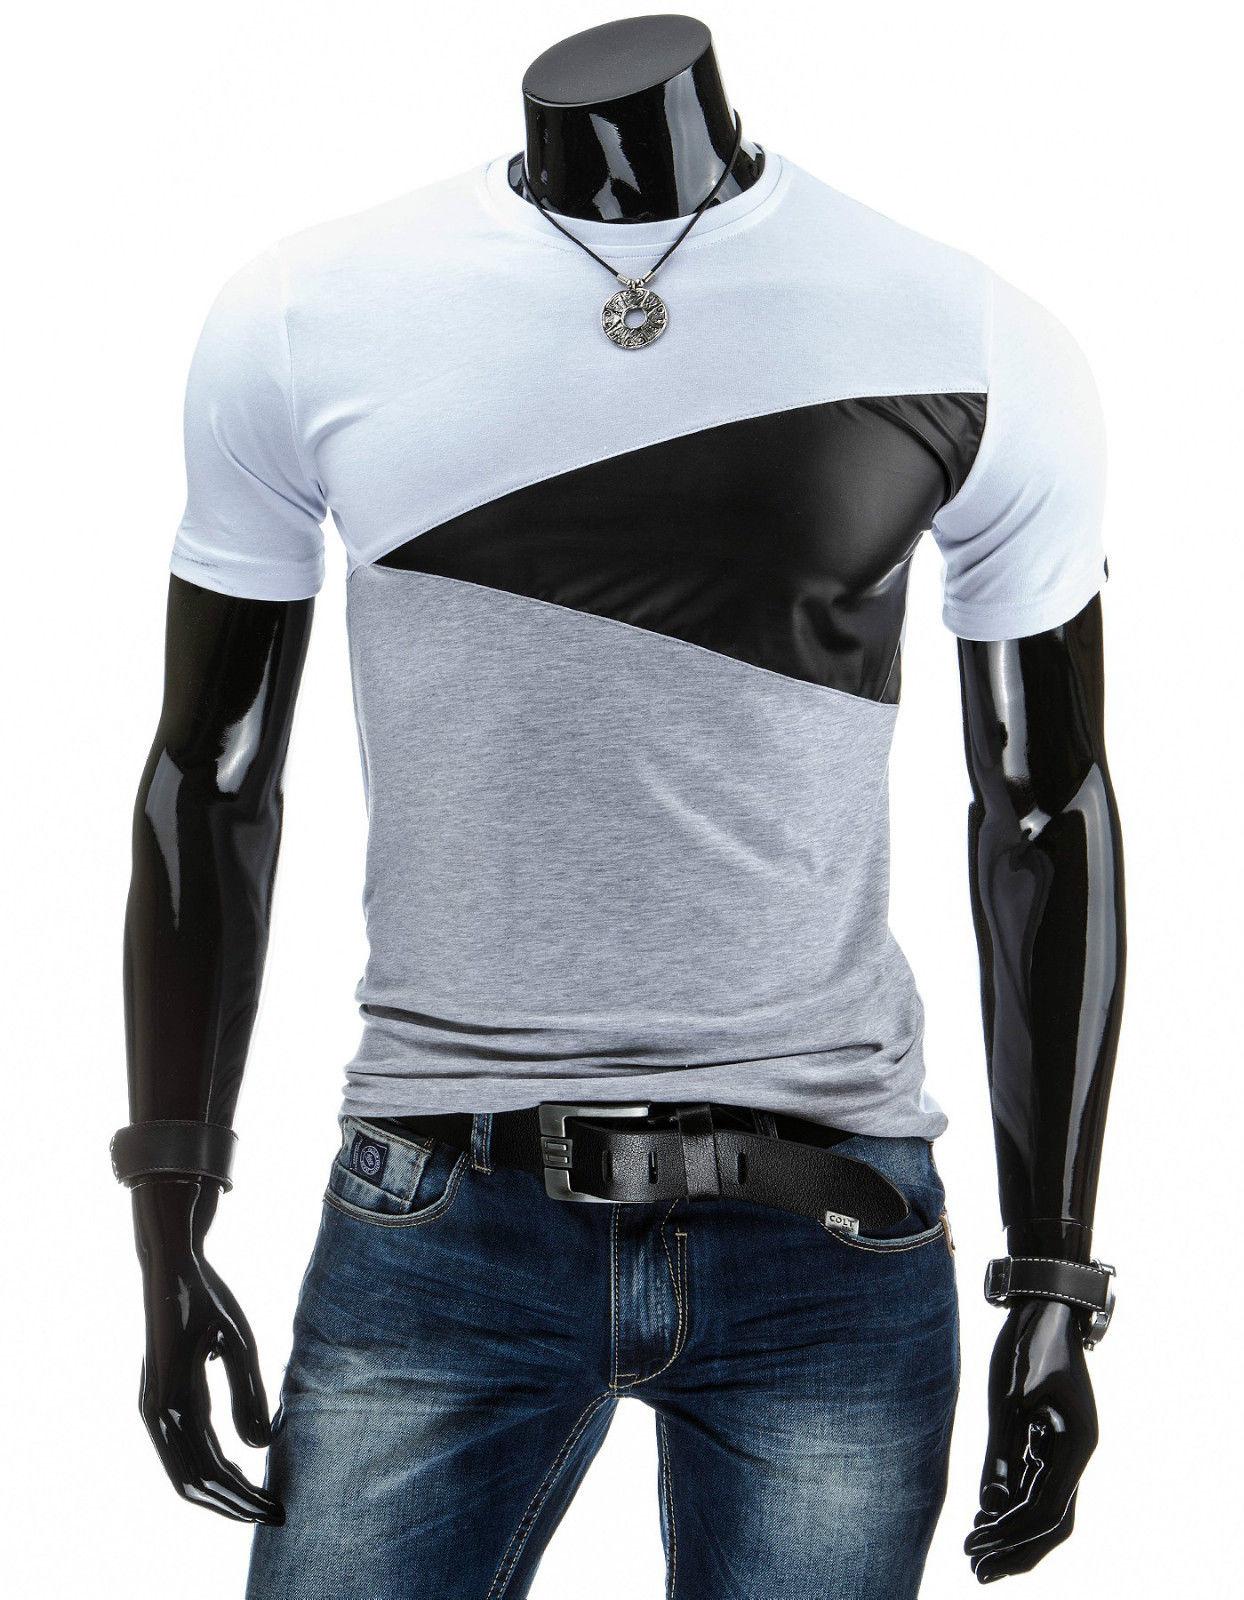 2017 Designs Mens T Shirt Slim Fit Crew Neck T-shirt Men Short Sleeve Casual tshirt Tee Tops M-XXL  XSS